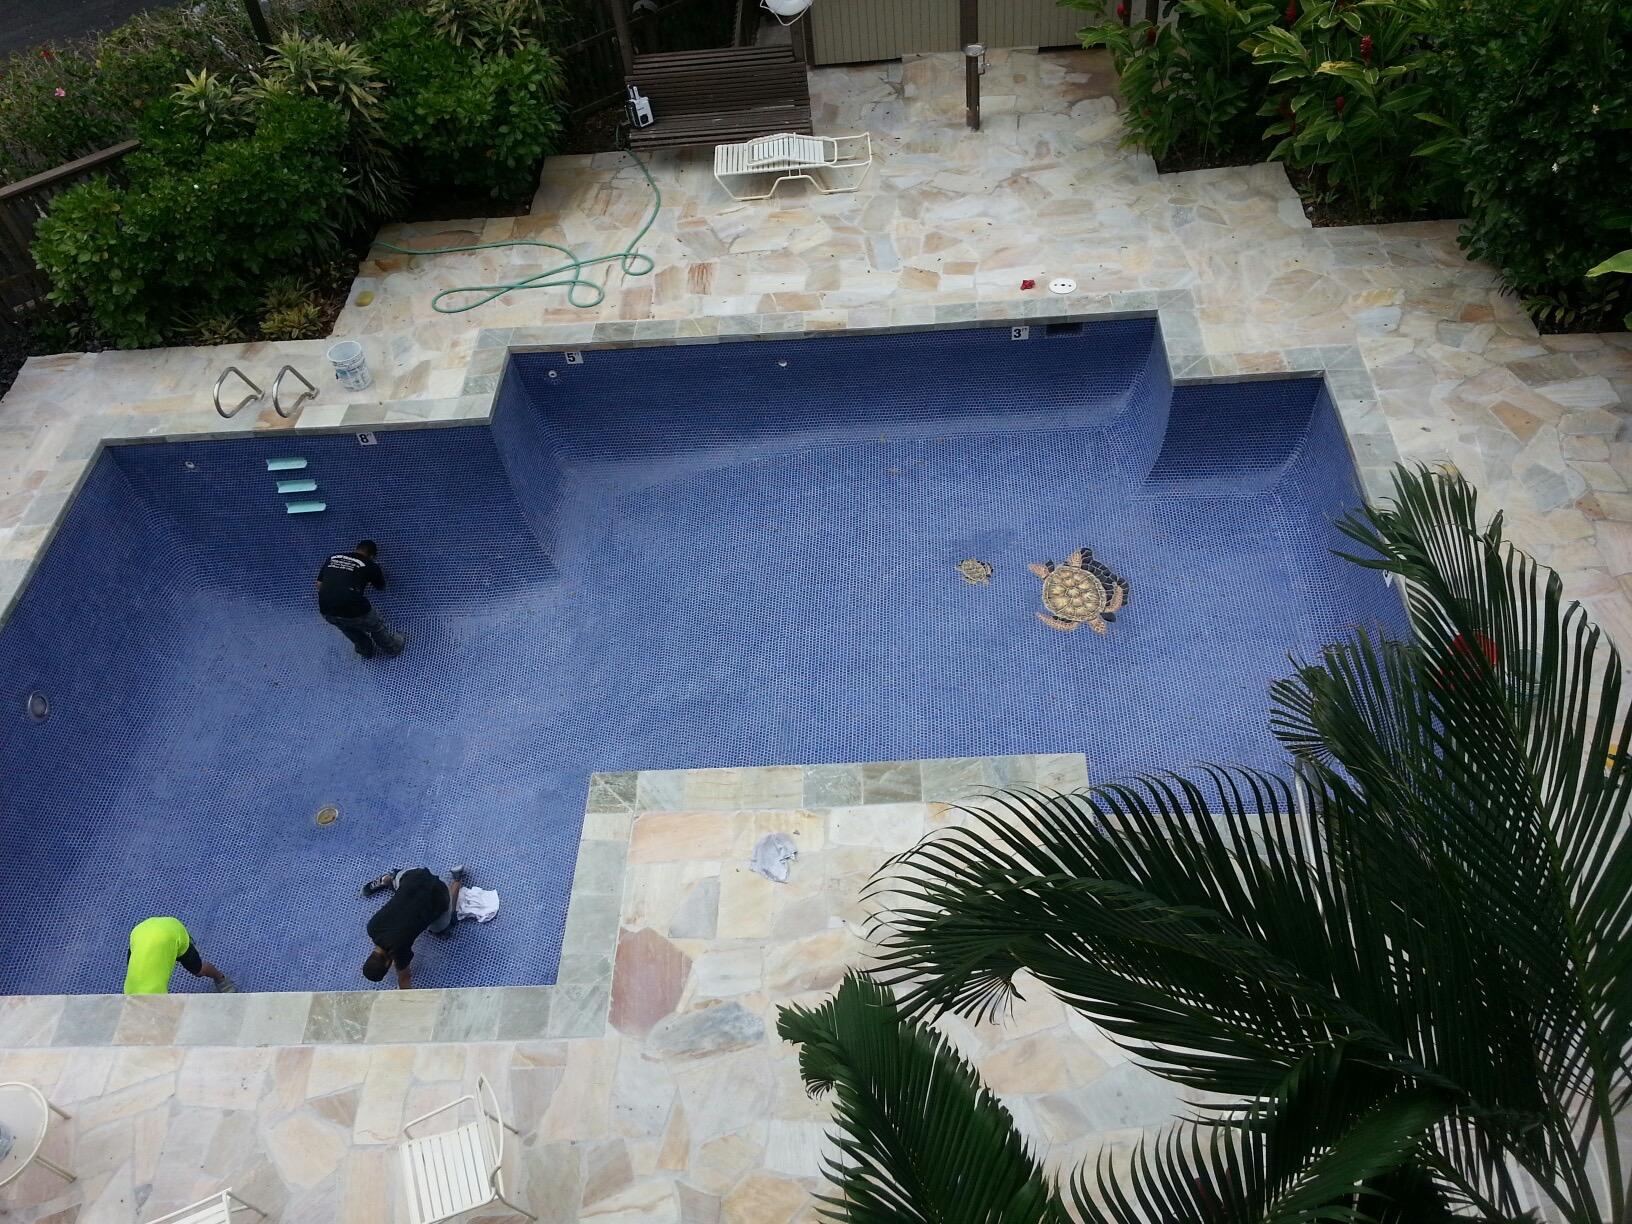 Turtles being Installed